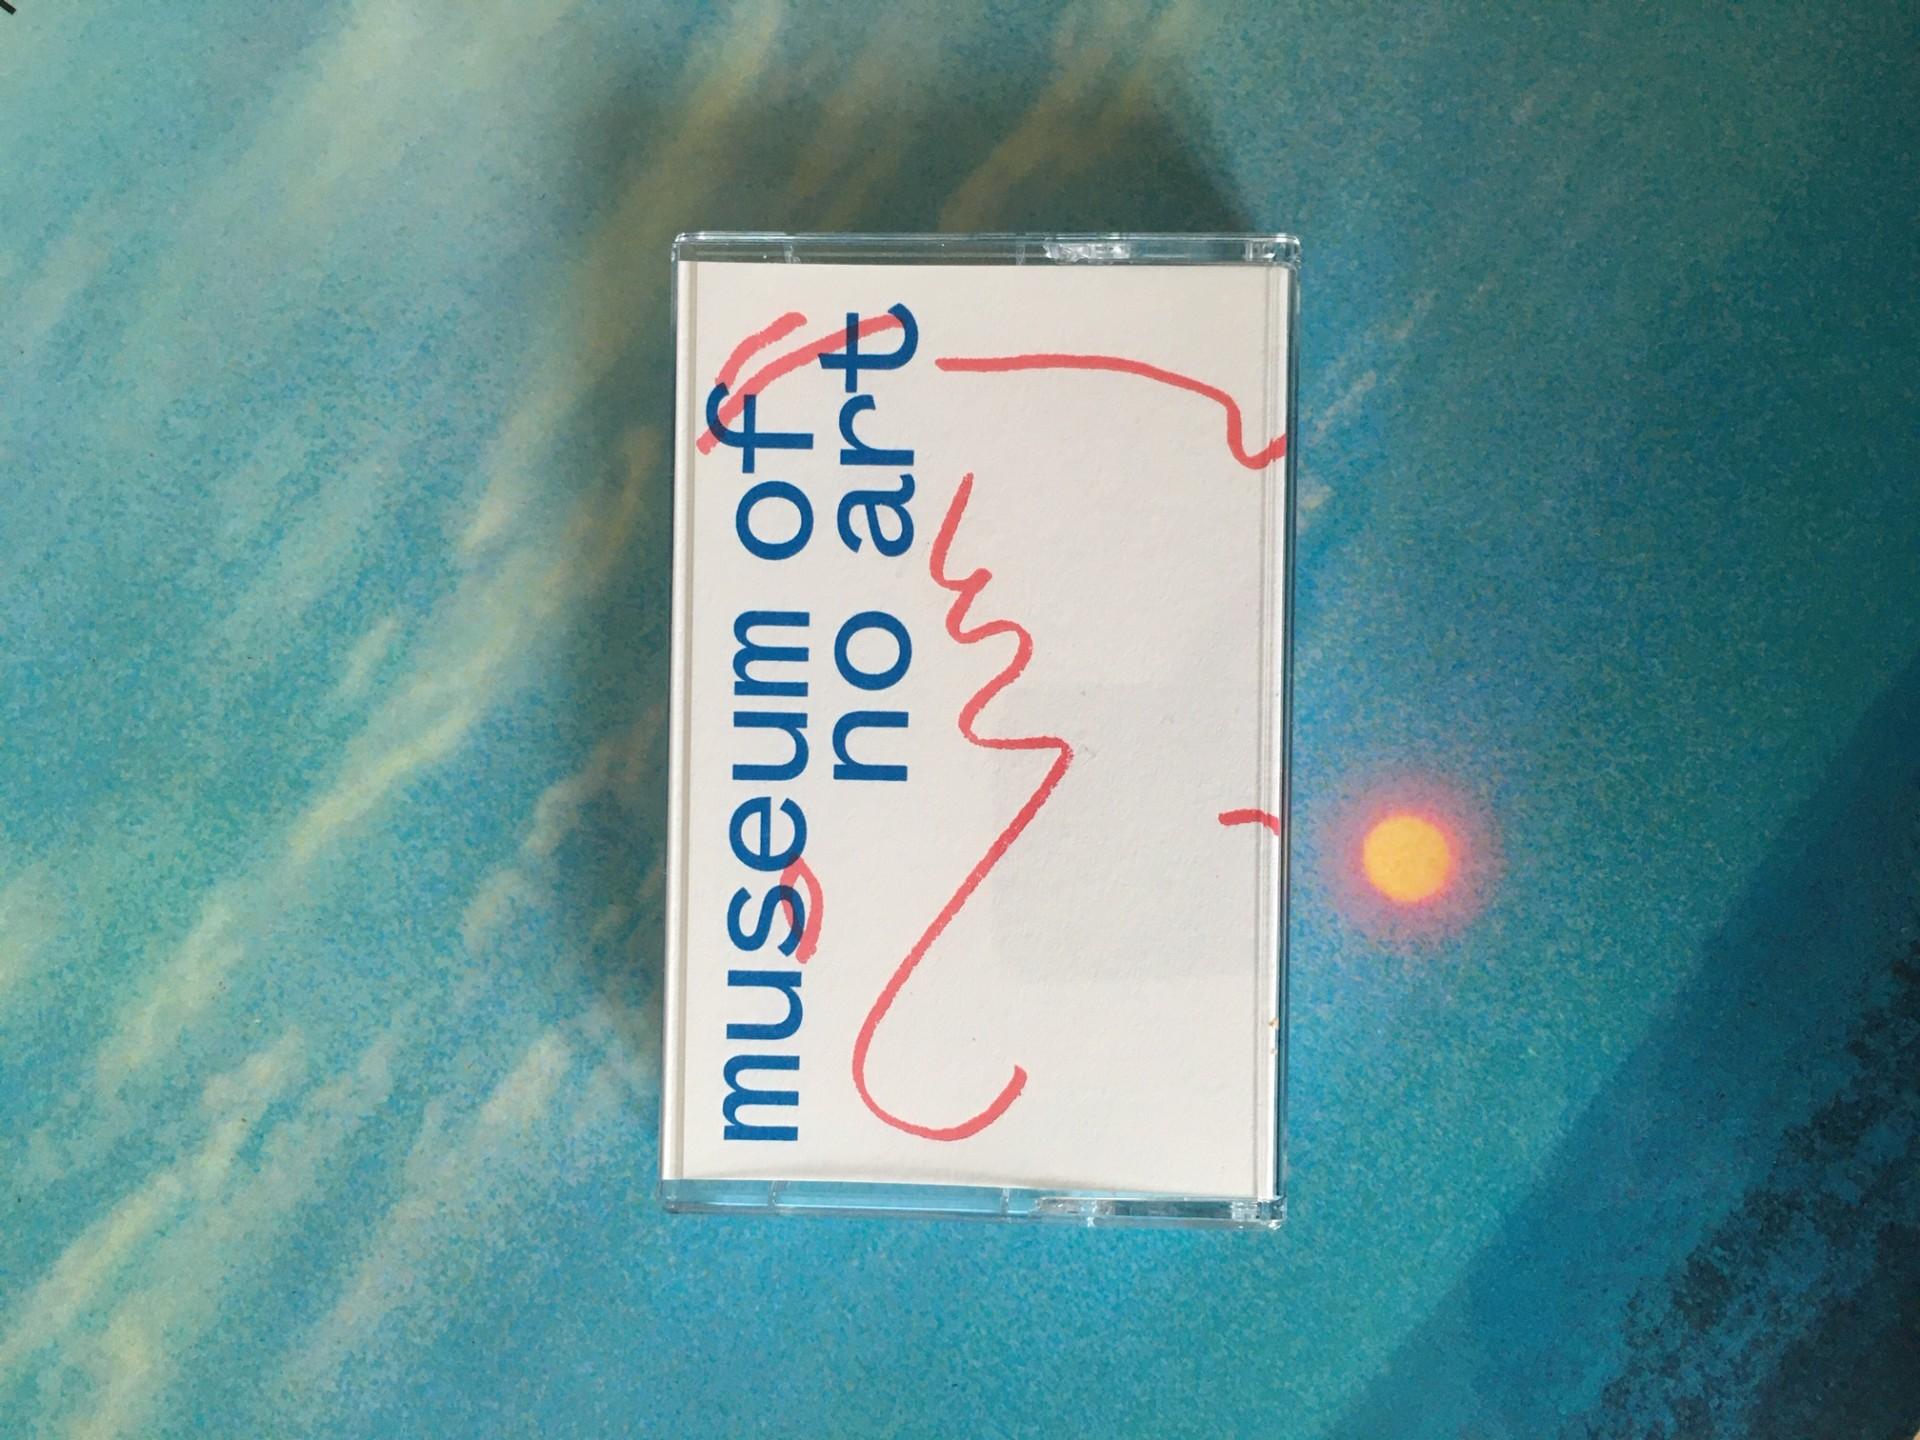 MUSEUM OF NO ART